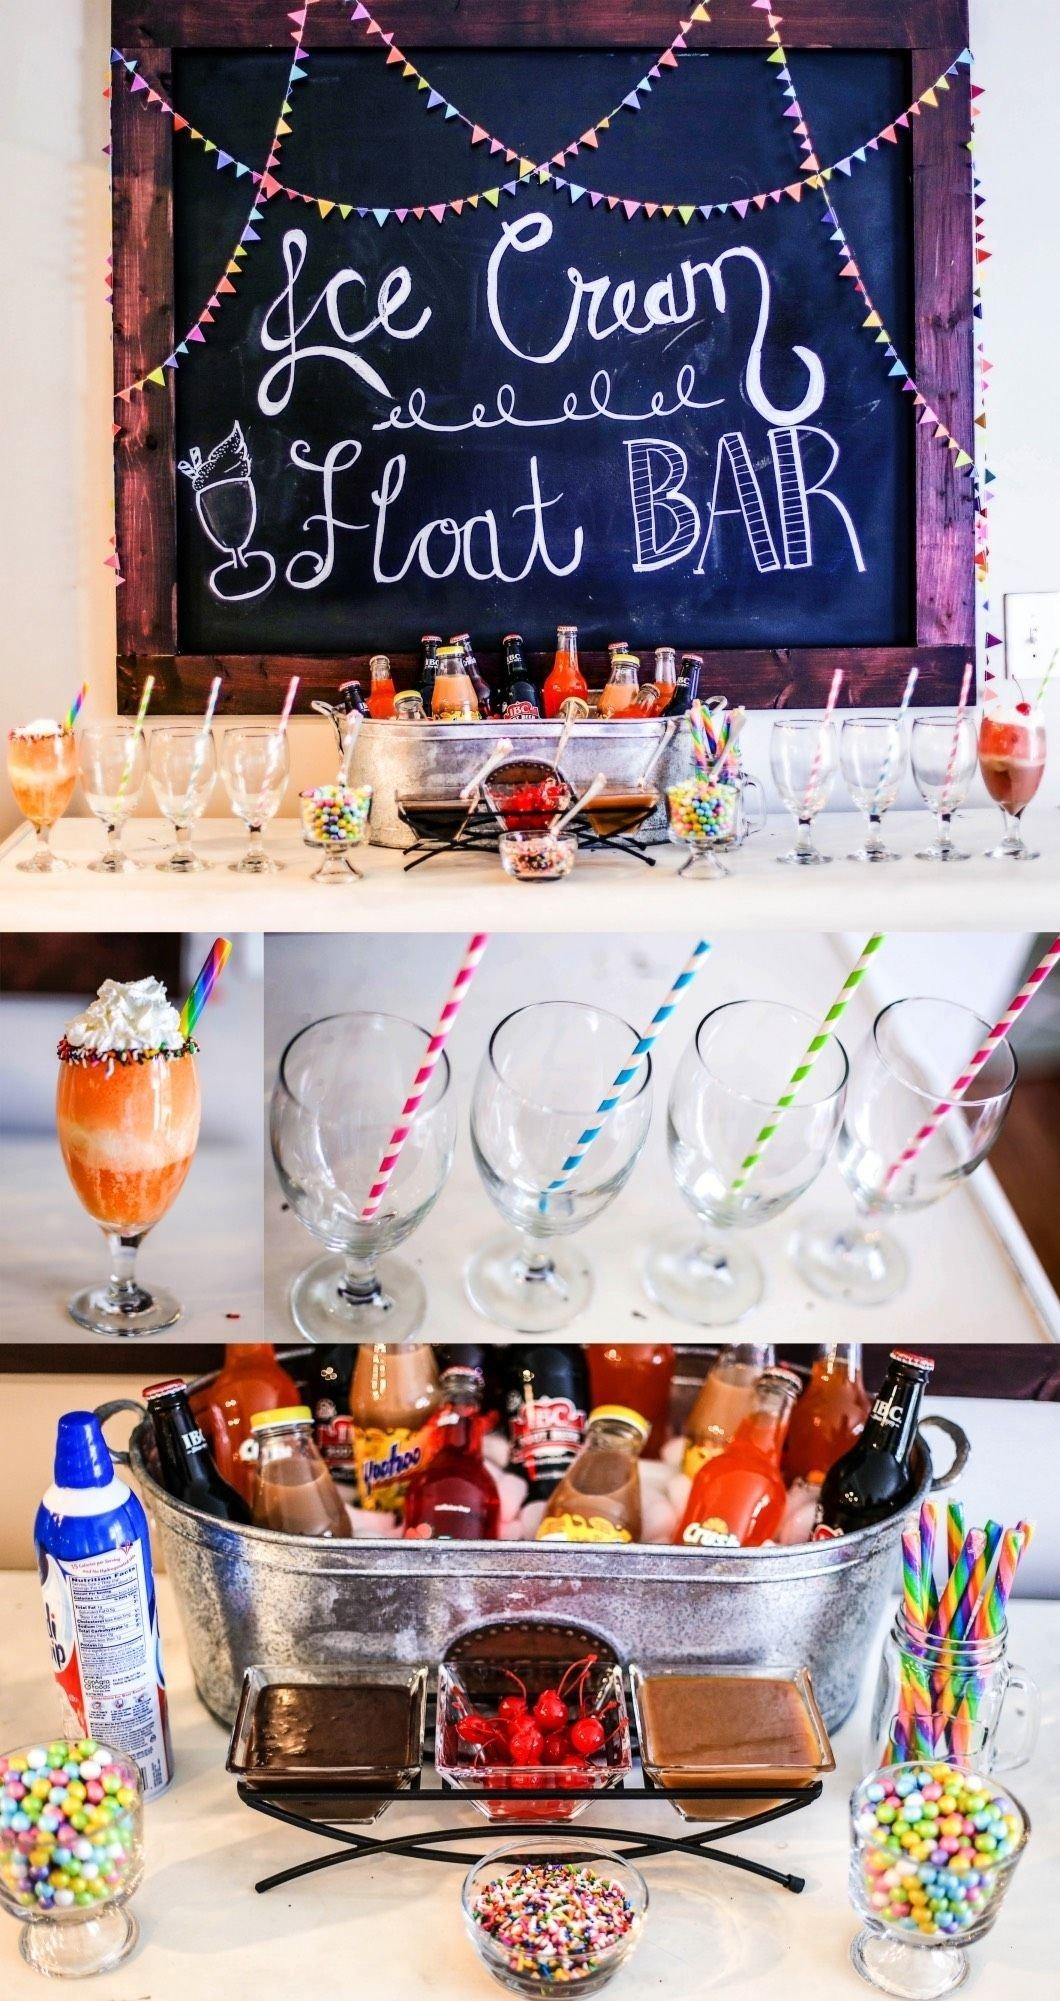 10 Lovely Christmas Party Ideas For Teenagers ice cream float bar bar sleepover and birthdays 2020